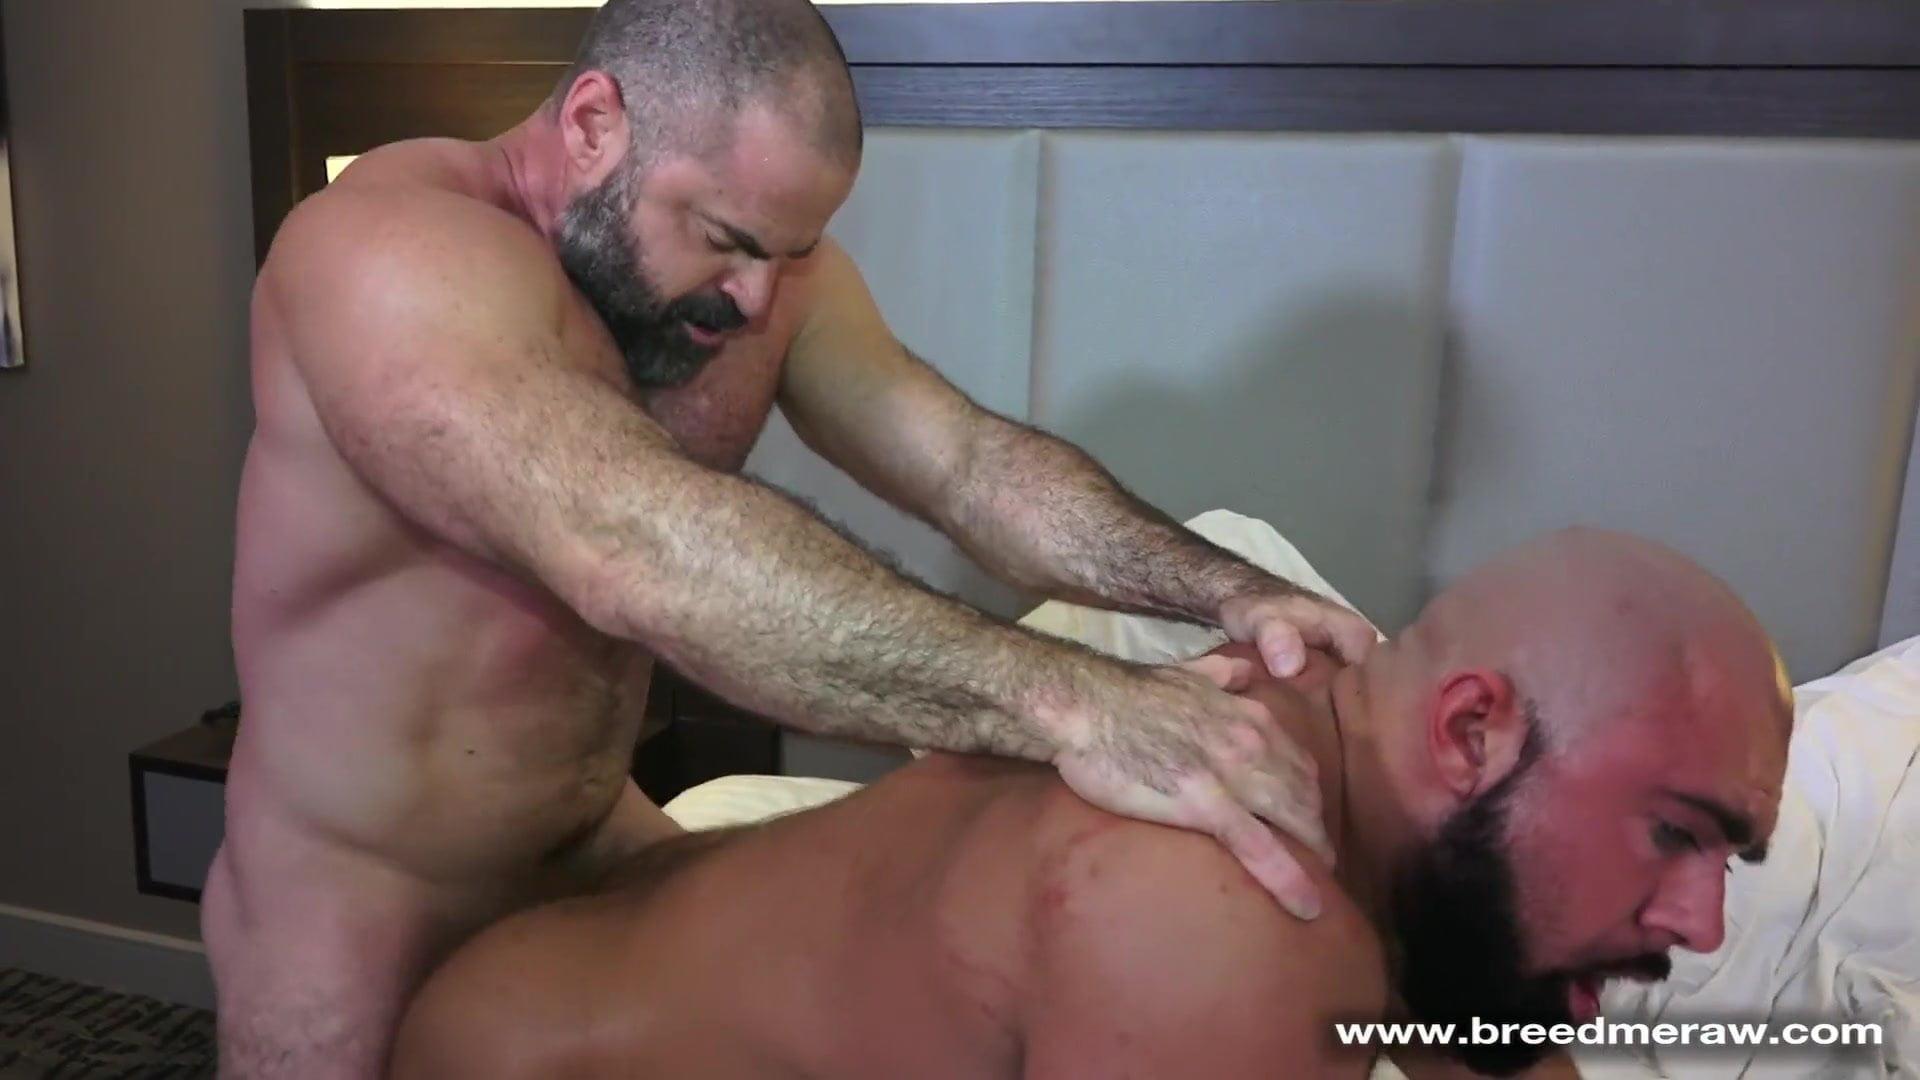 Bear gay sex Gay Porn